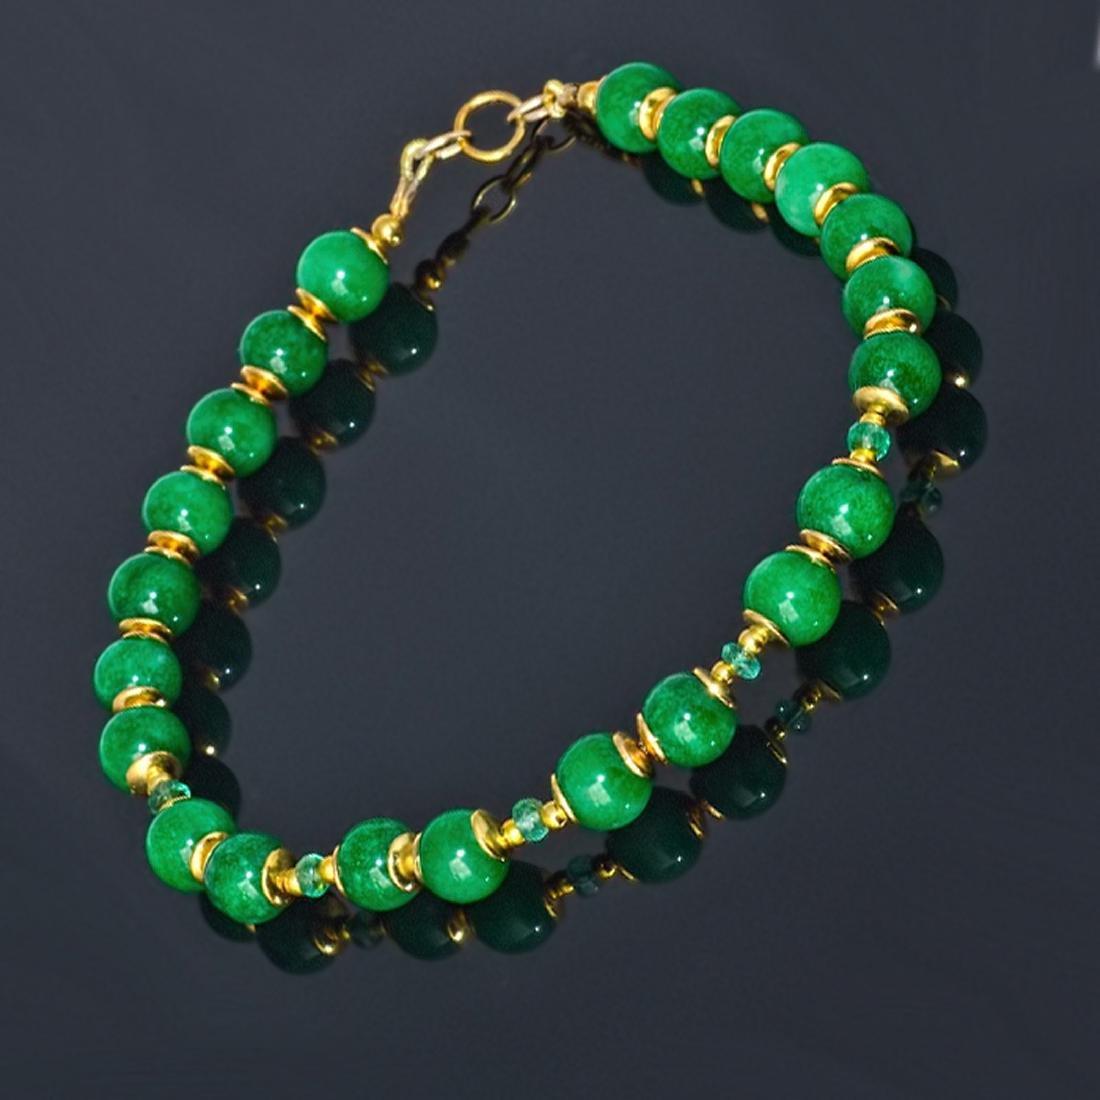 14K Gold Imperial Emerald Green Jade Bracelet - 3